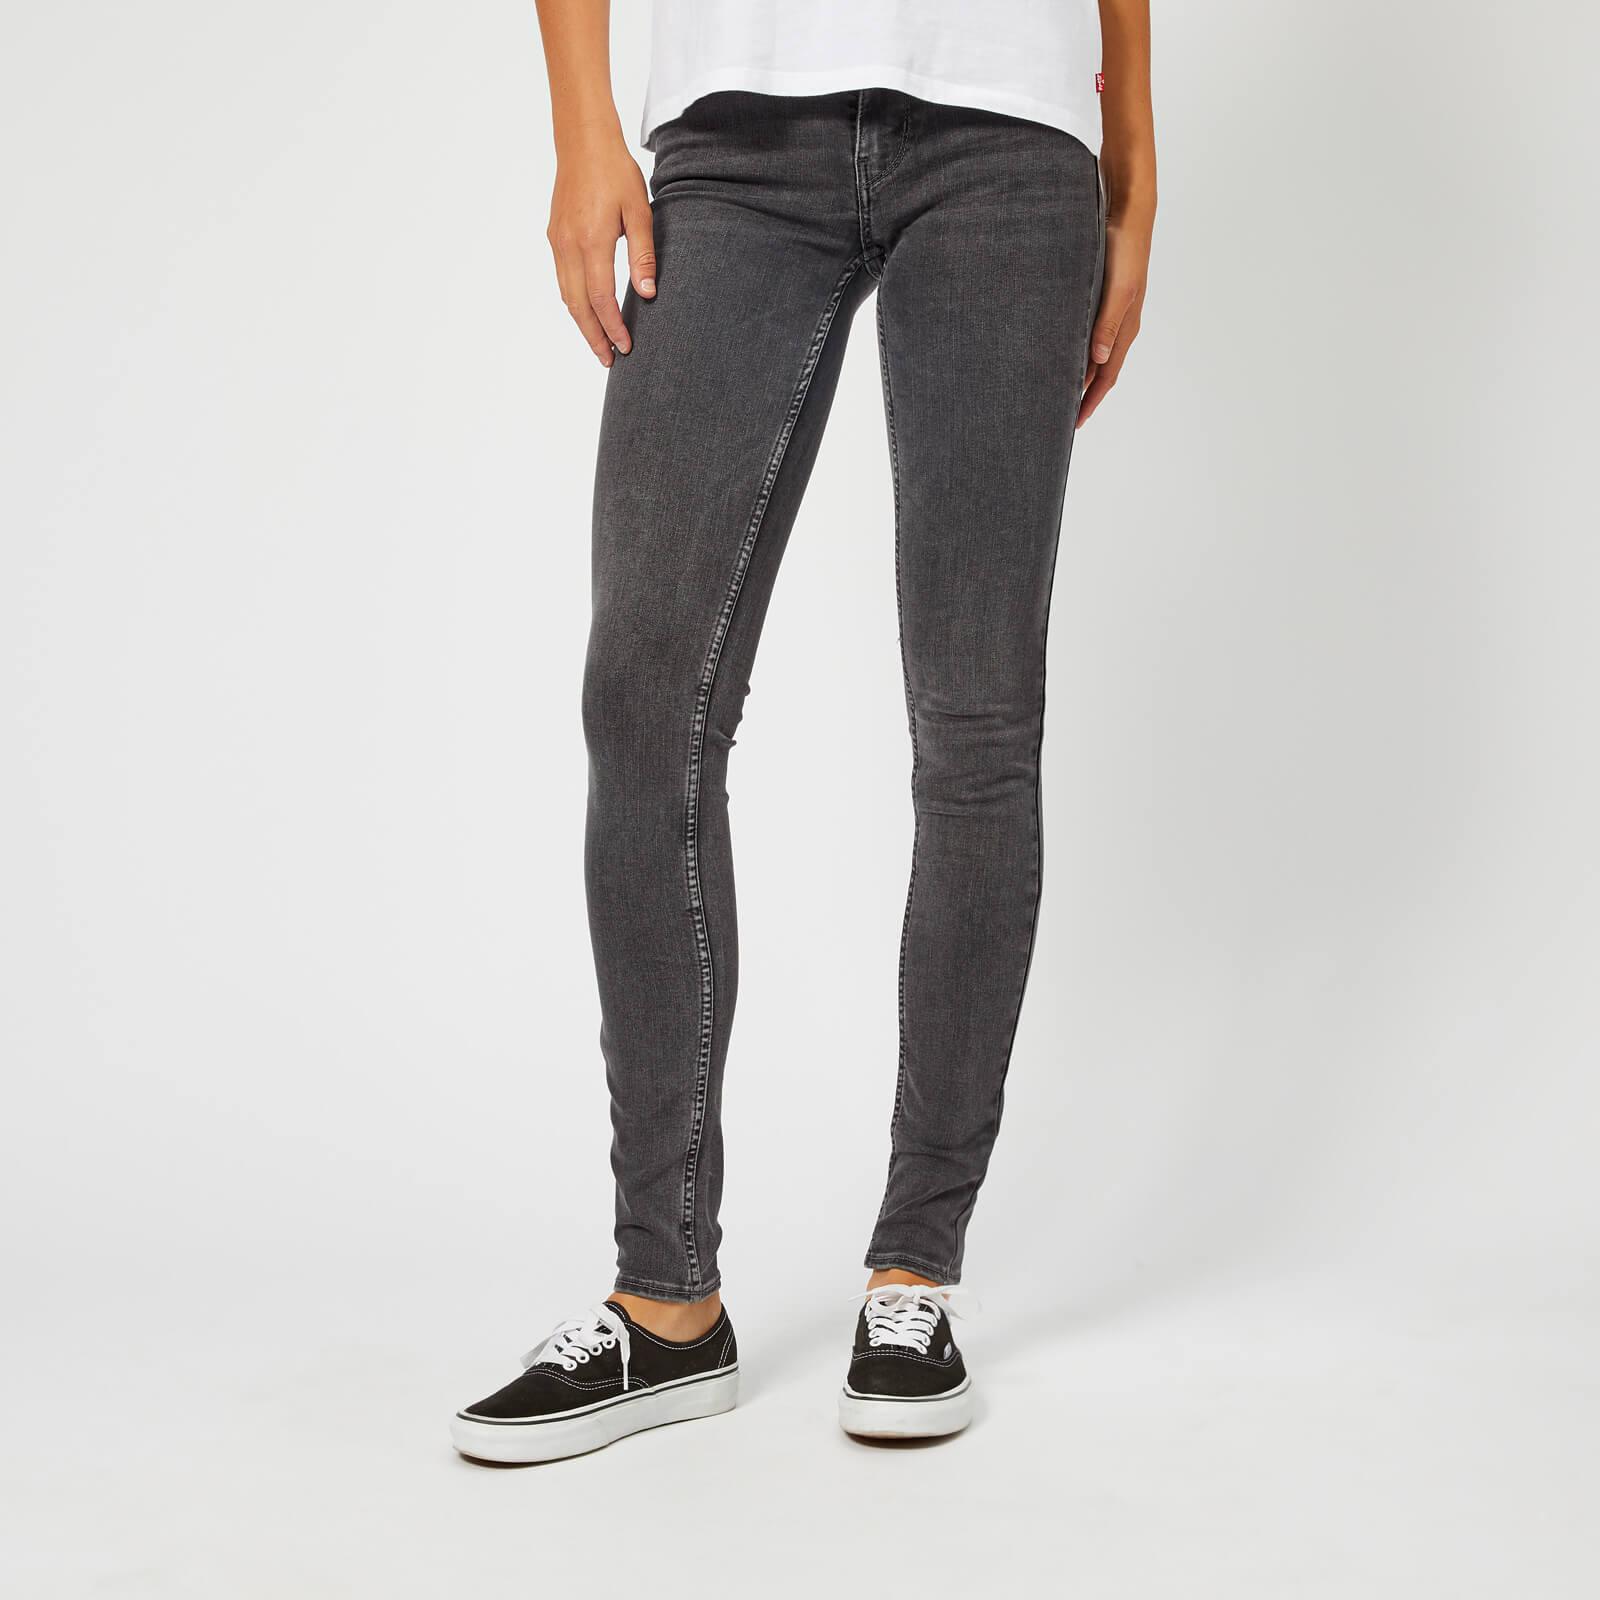 821da079094fe Levi s Women s Innovation Super Skinny Jeans - Fancy That Clothing ...